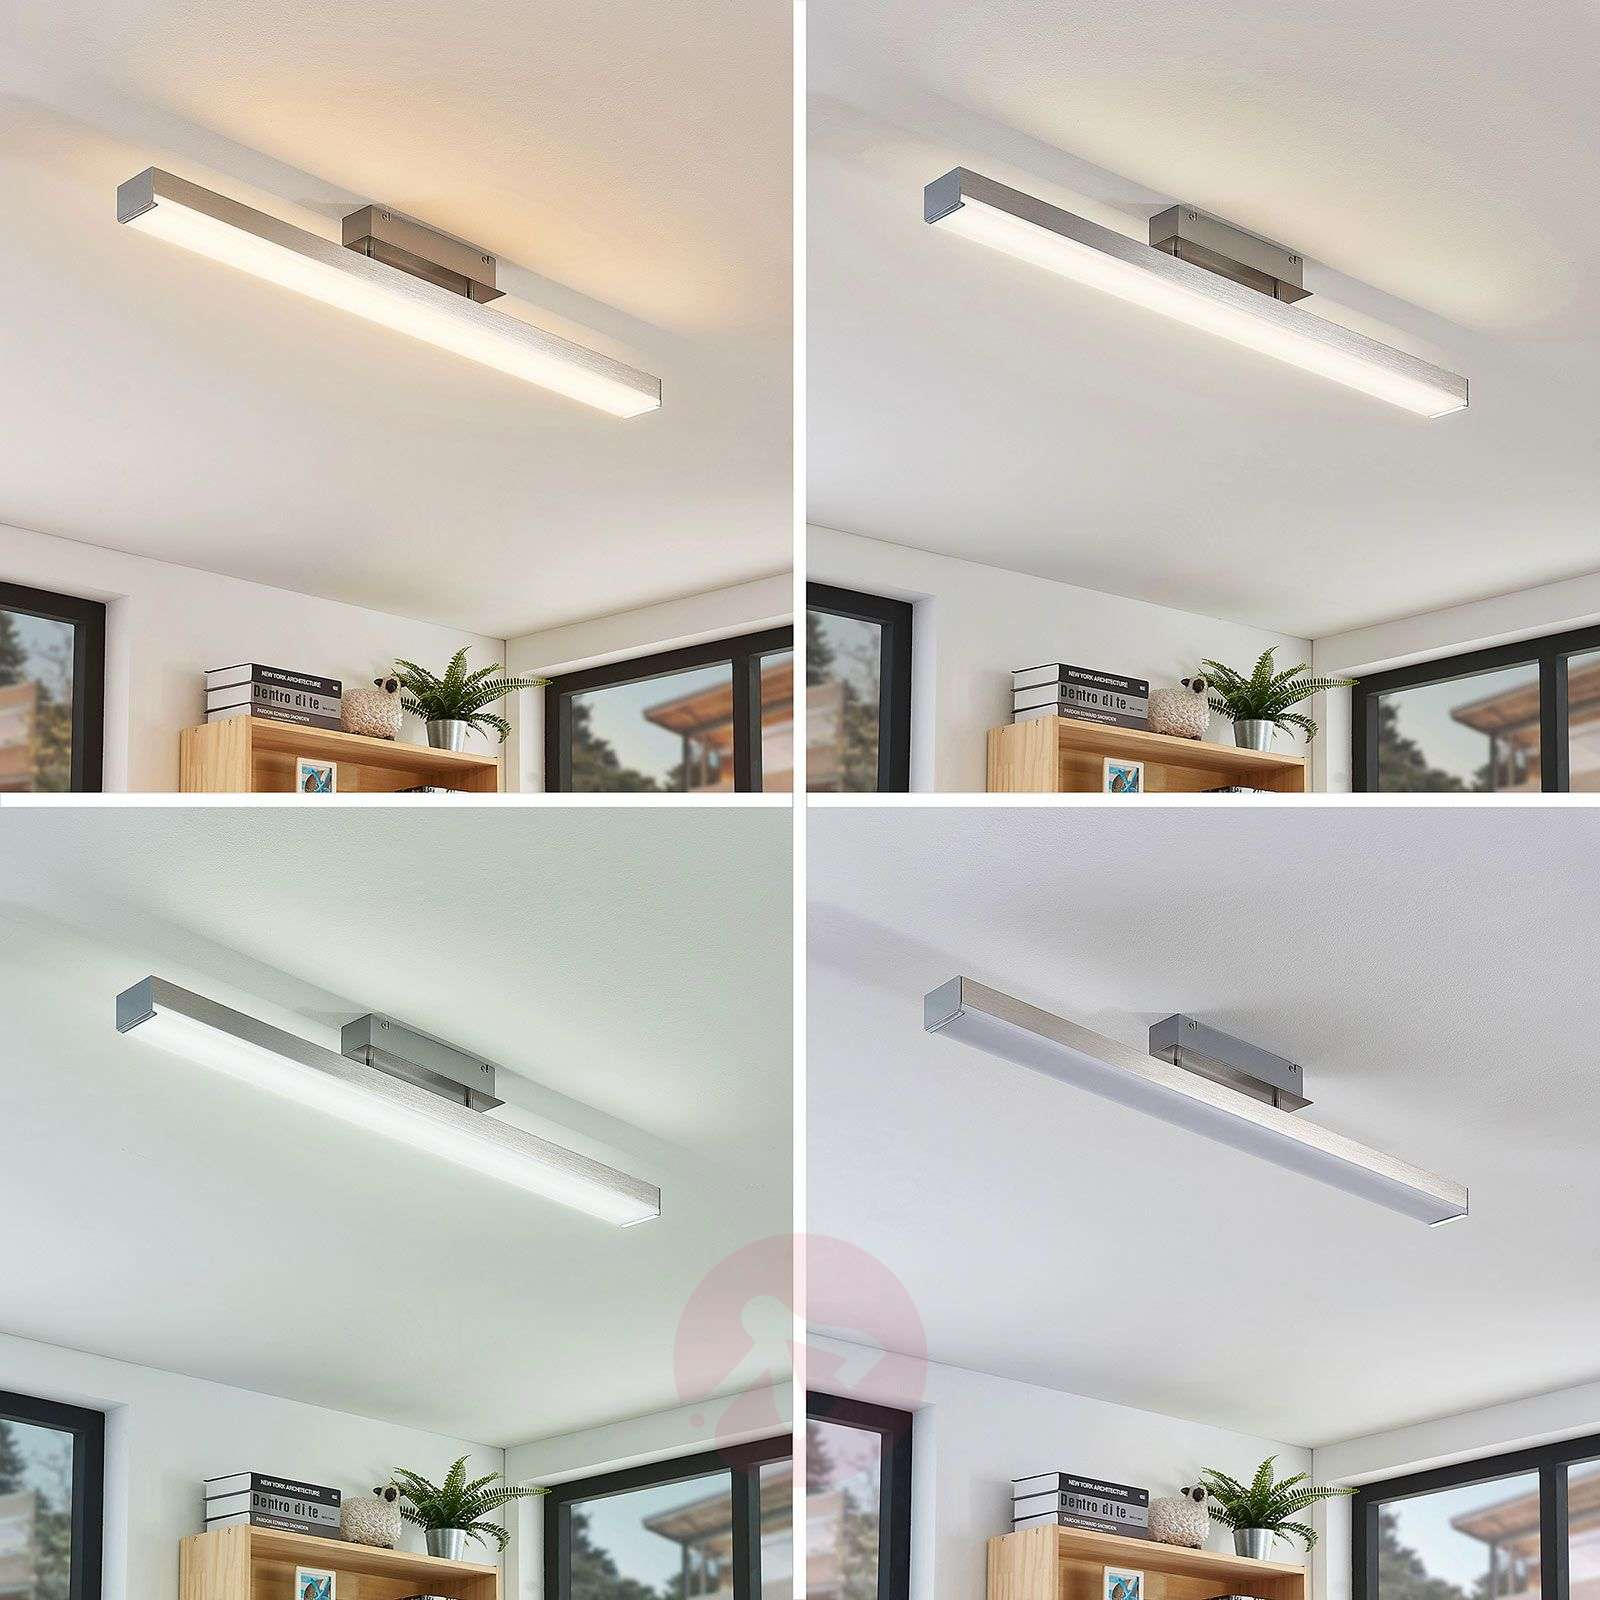 LED-kattovalaisin Keyan WiZ kulmikas pitkä nikkeli-8032181-02